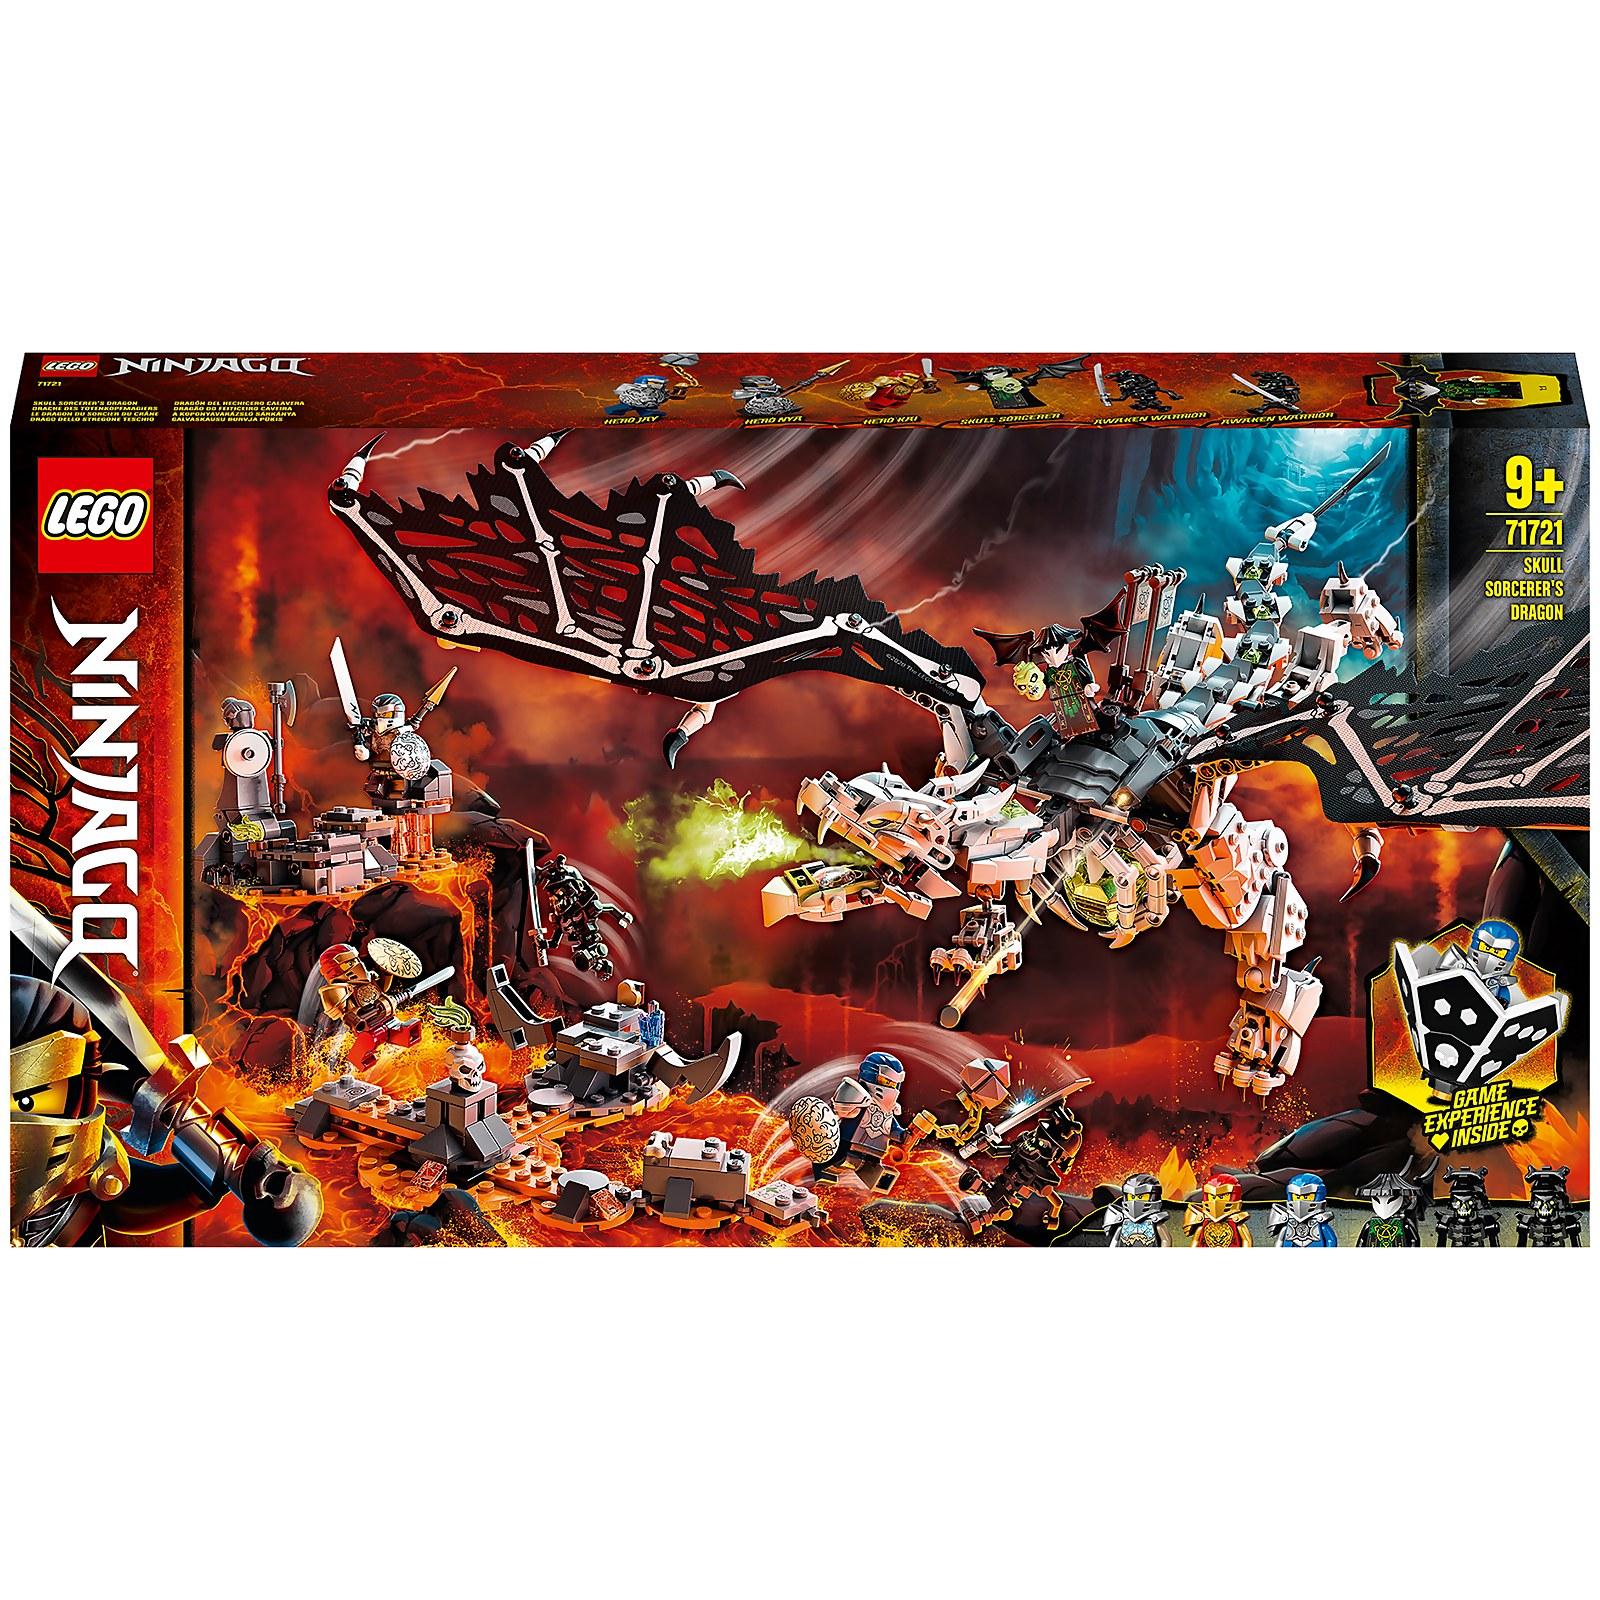 Image of 71721 LEGO® NINJAGO Dragon of the Dead Head Magician